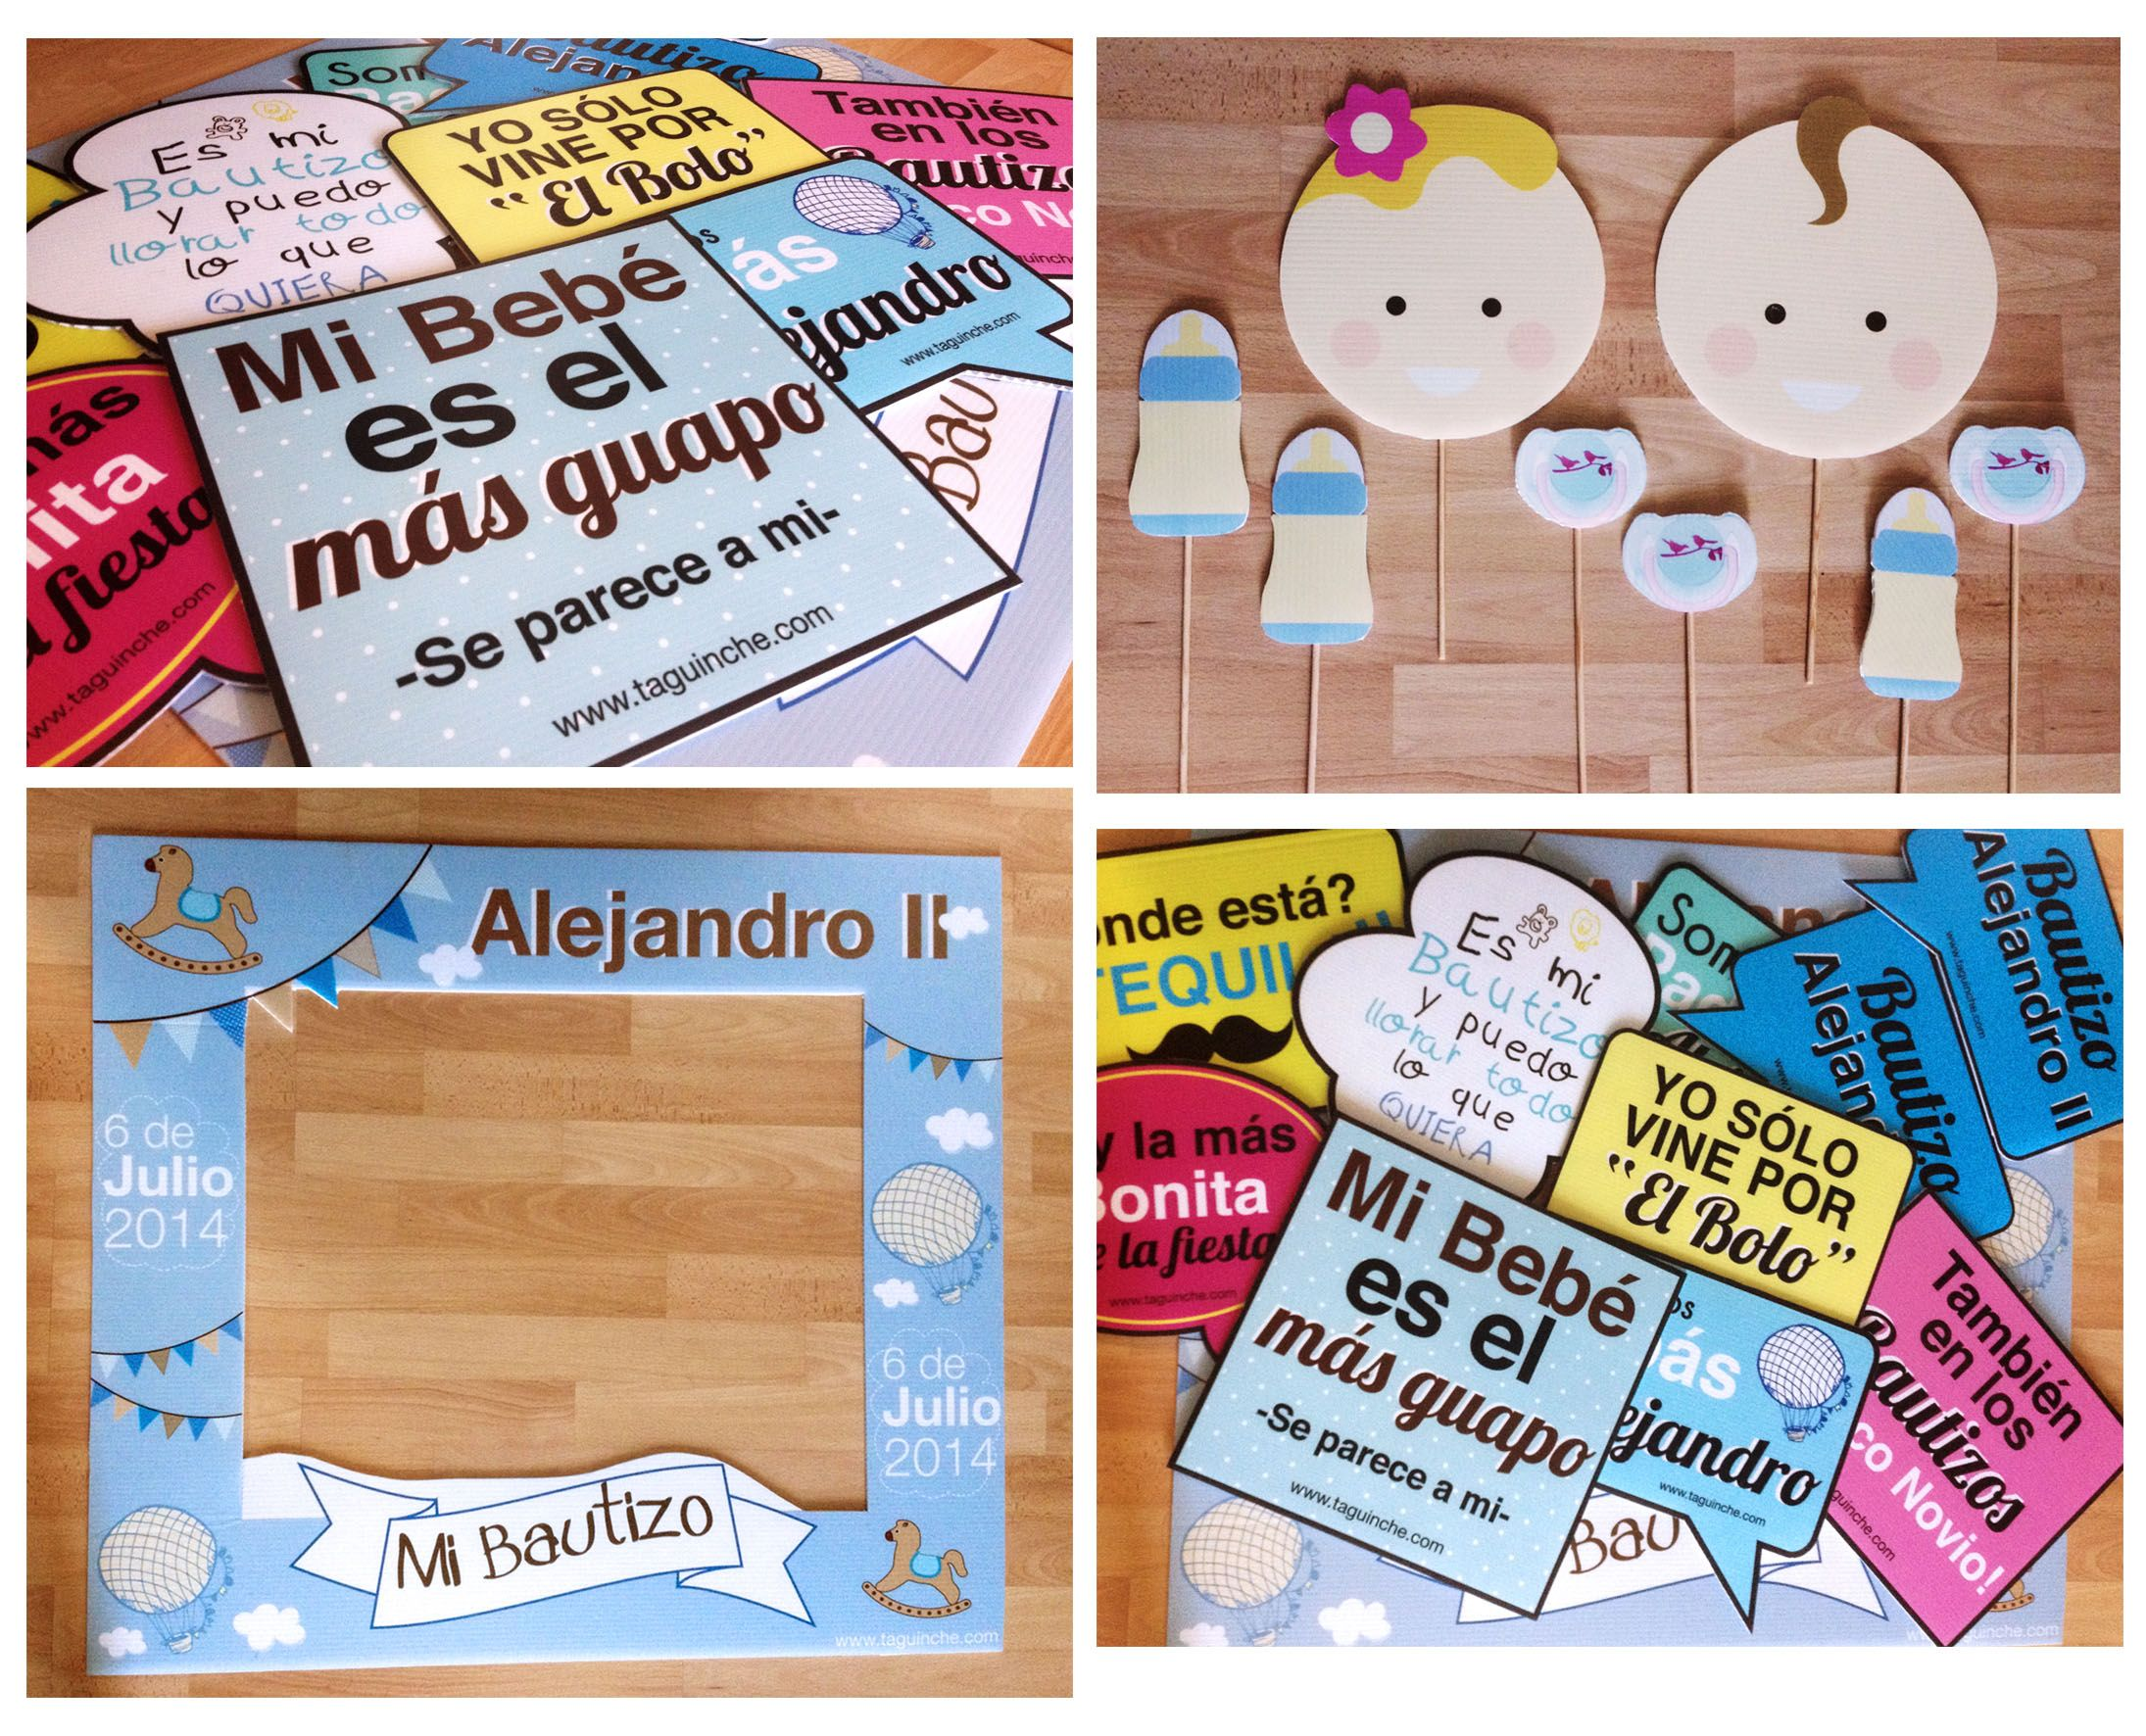 Paquete de letreros Bautizo www.taguinche.com | bautizo | Pinterest ...